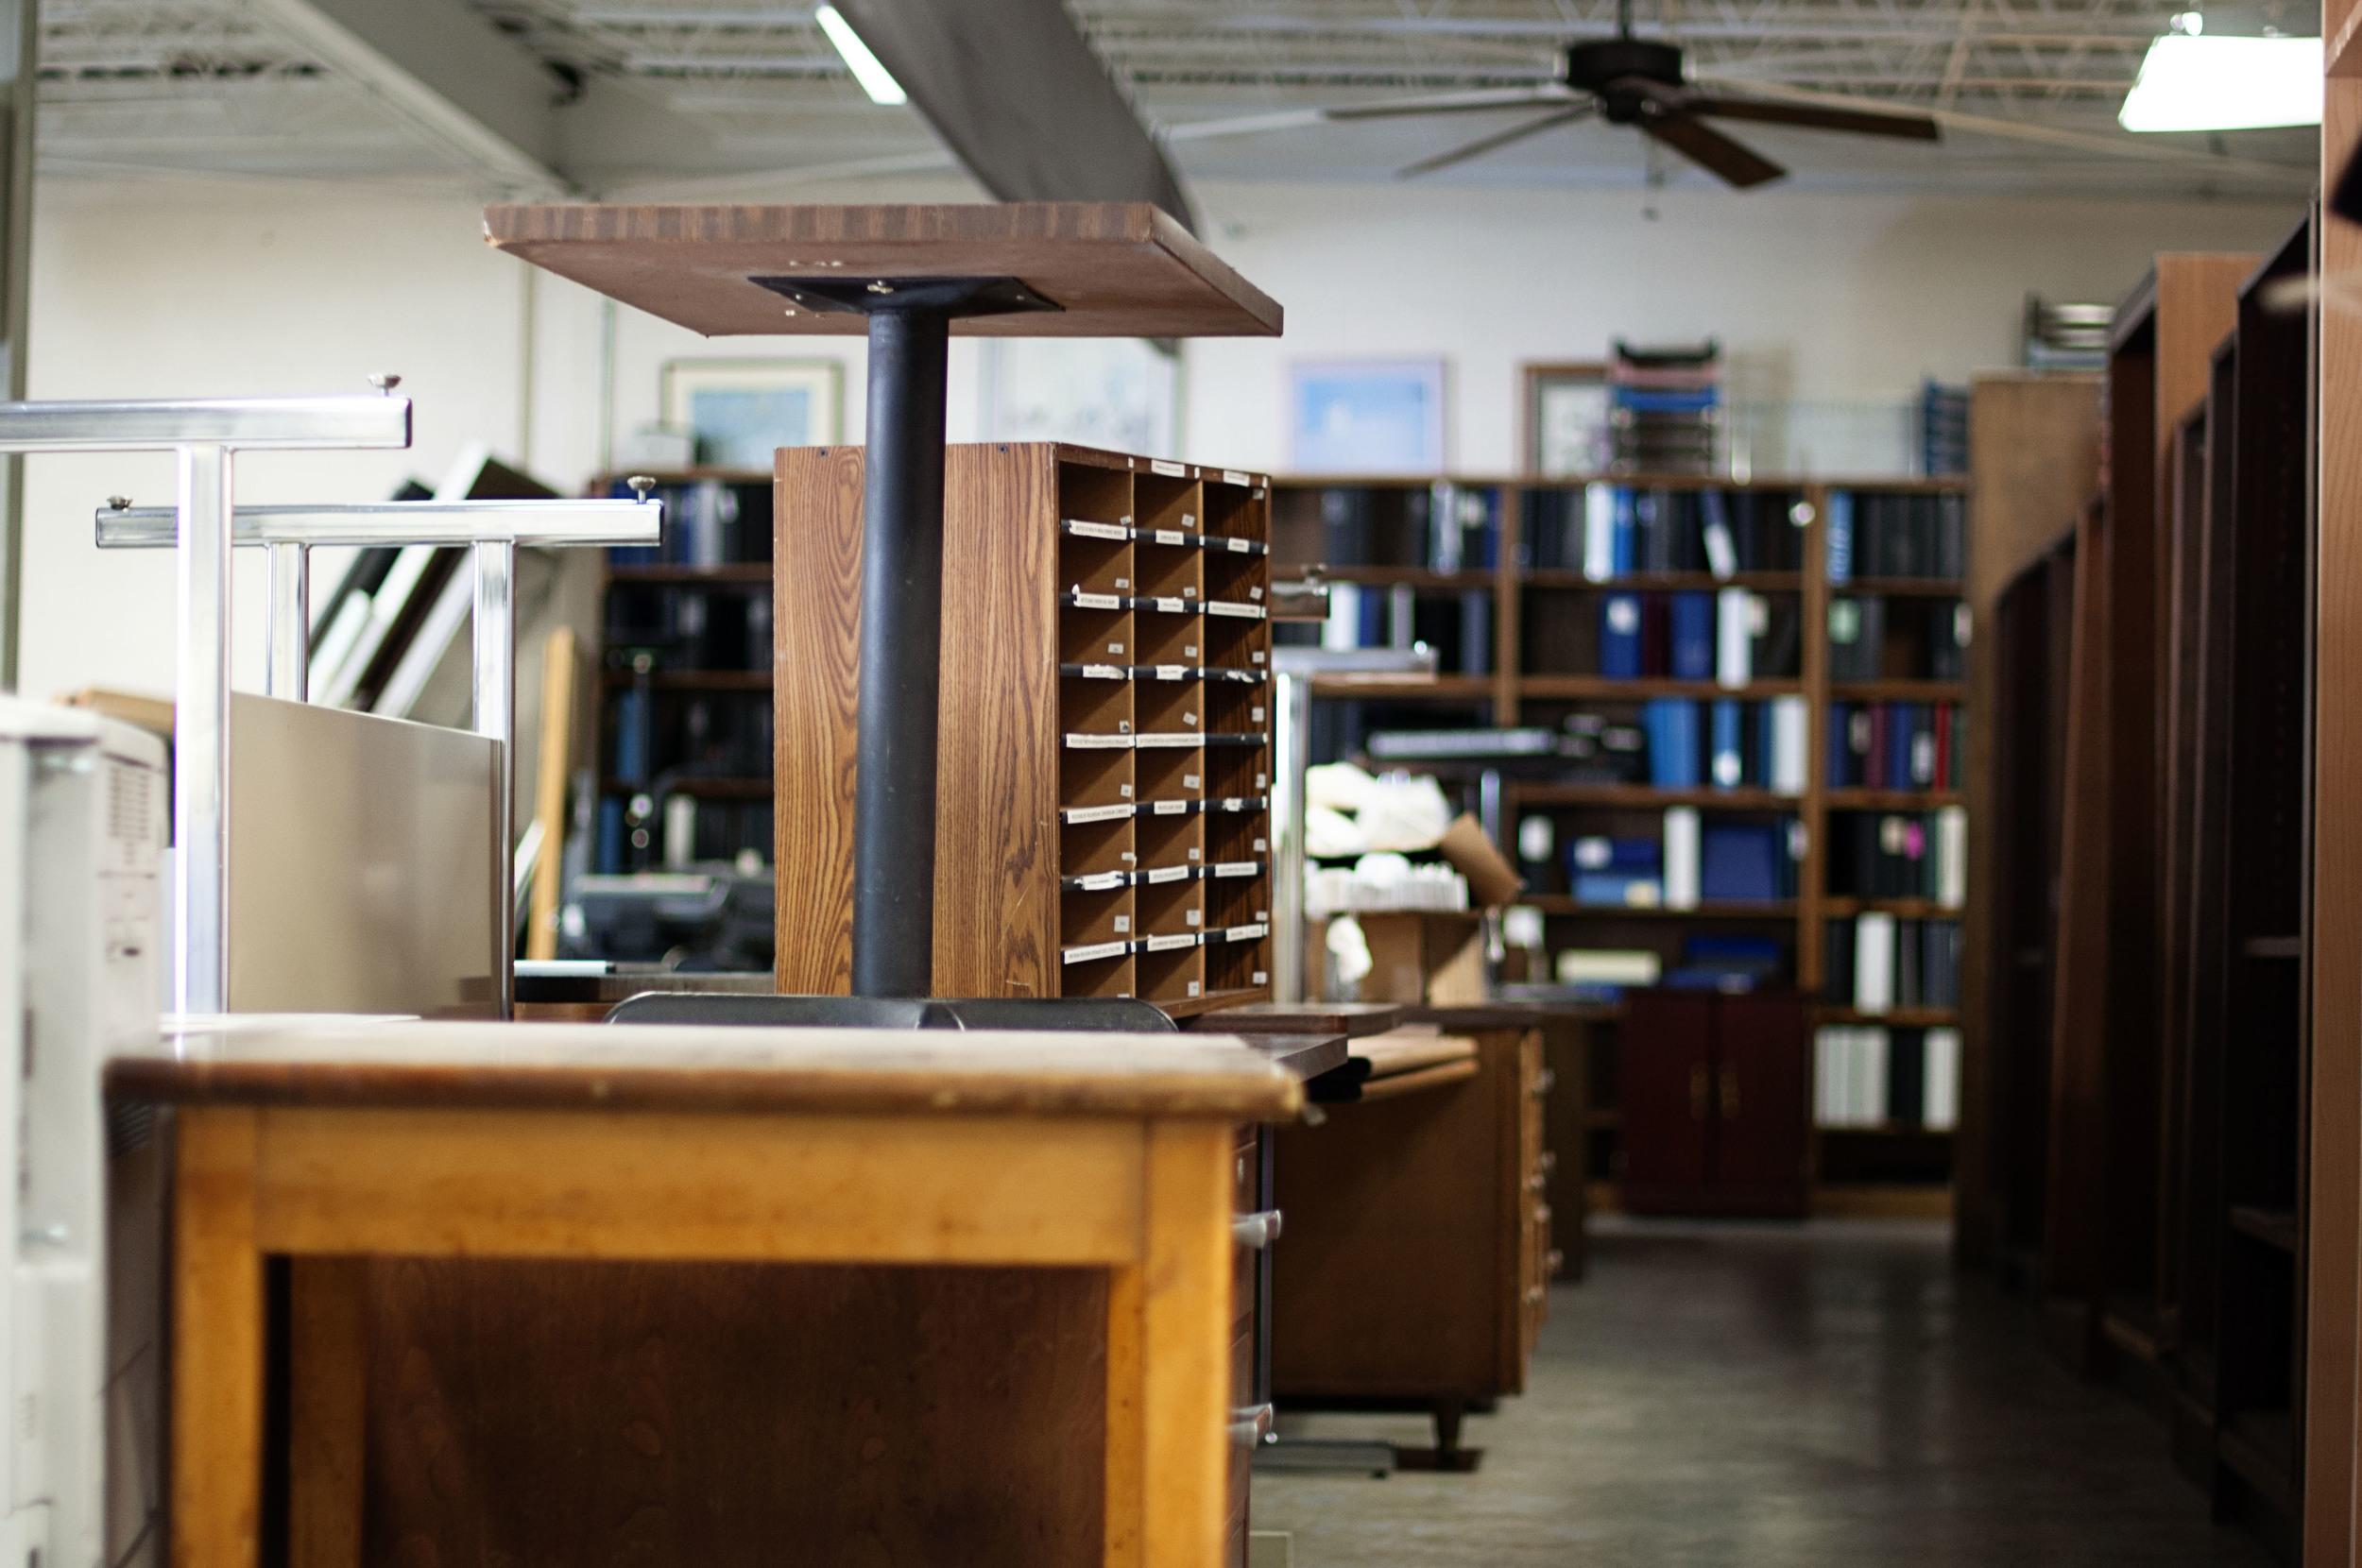 University of North Carolina - Chapel Hill Surplus Store, NC